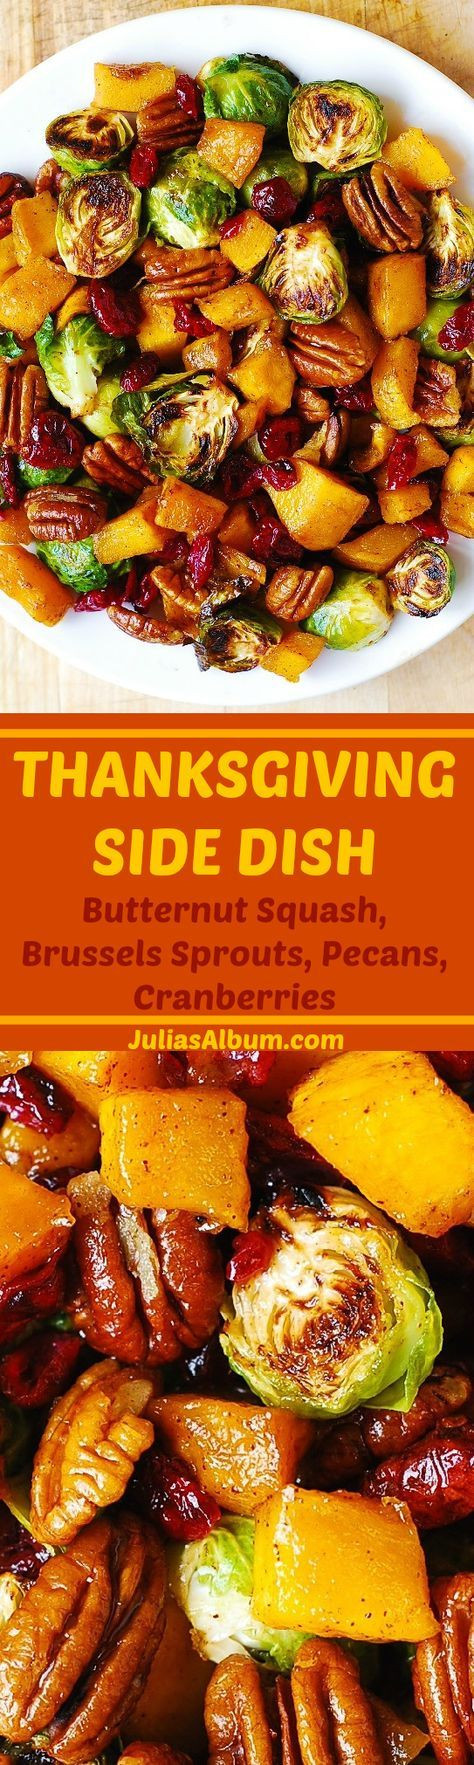 Vegetarian Thanksgiving Side Dishes  Best 25 Thanksgiving recipes ideas on Pinterest